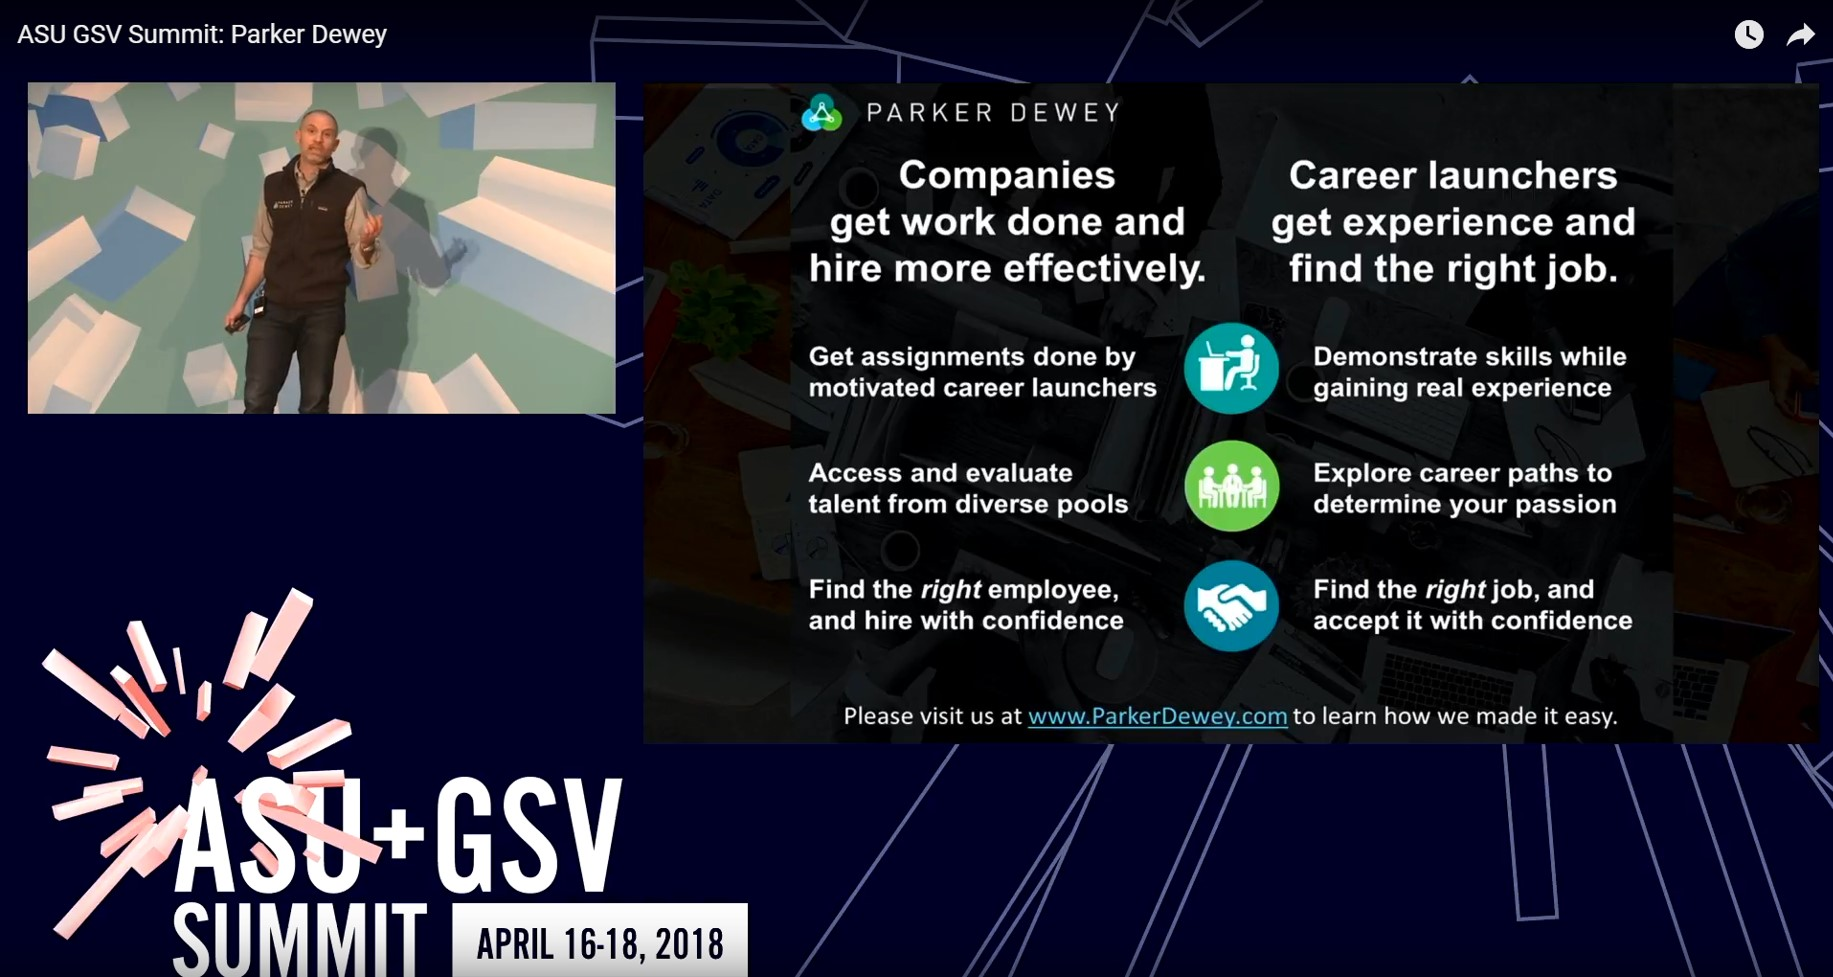 Parker Dewey Overview at AUS GSV 2018